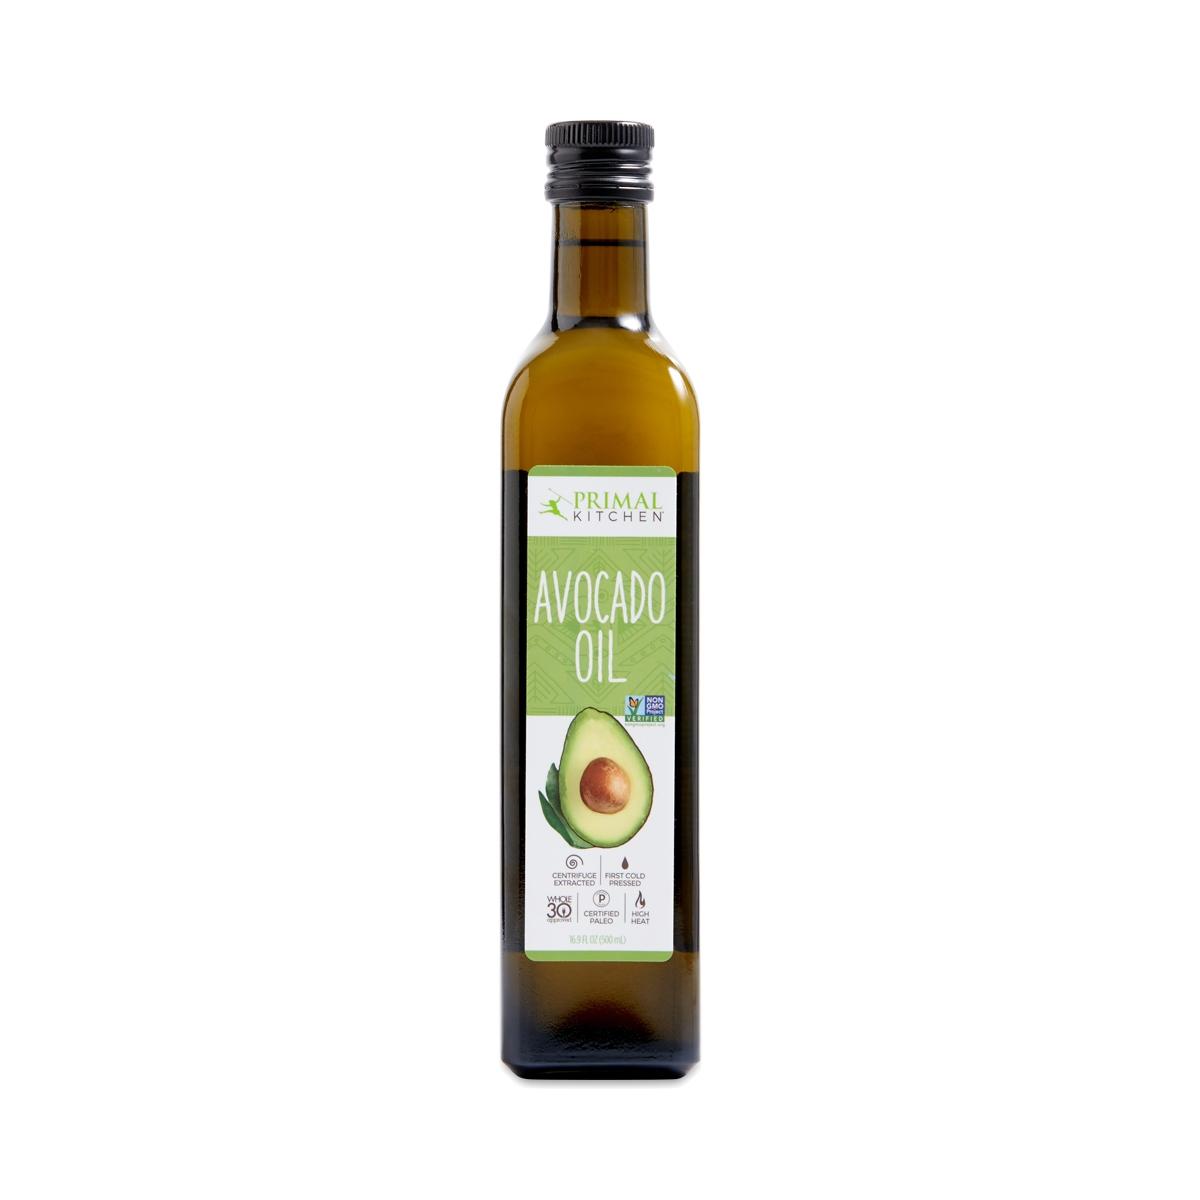 Primal Kitchen Avocado Oil 16.9 oz bottle